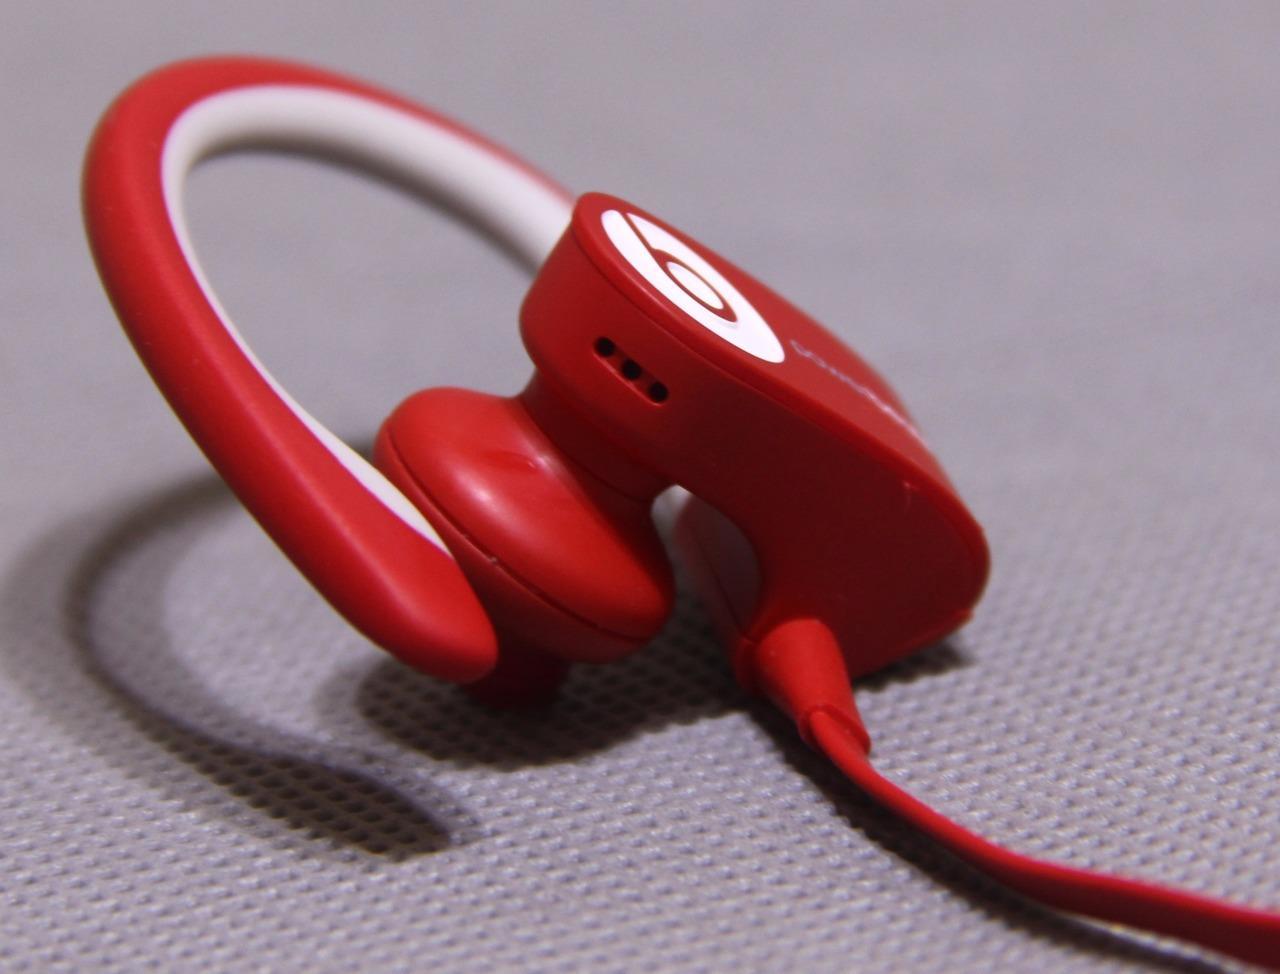 Earbuds for sleeping wireless - best wireless earbuds for running